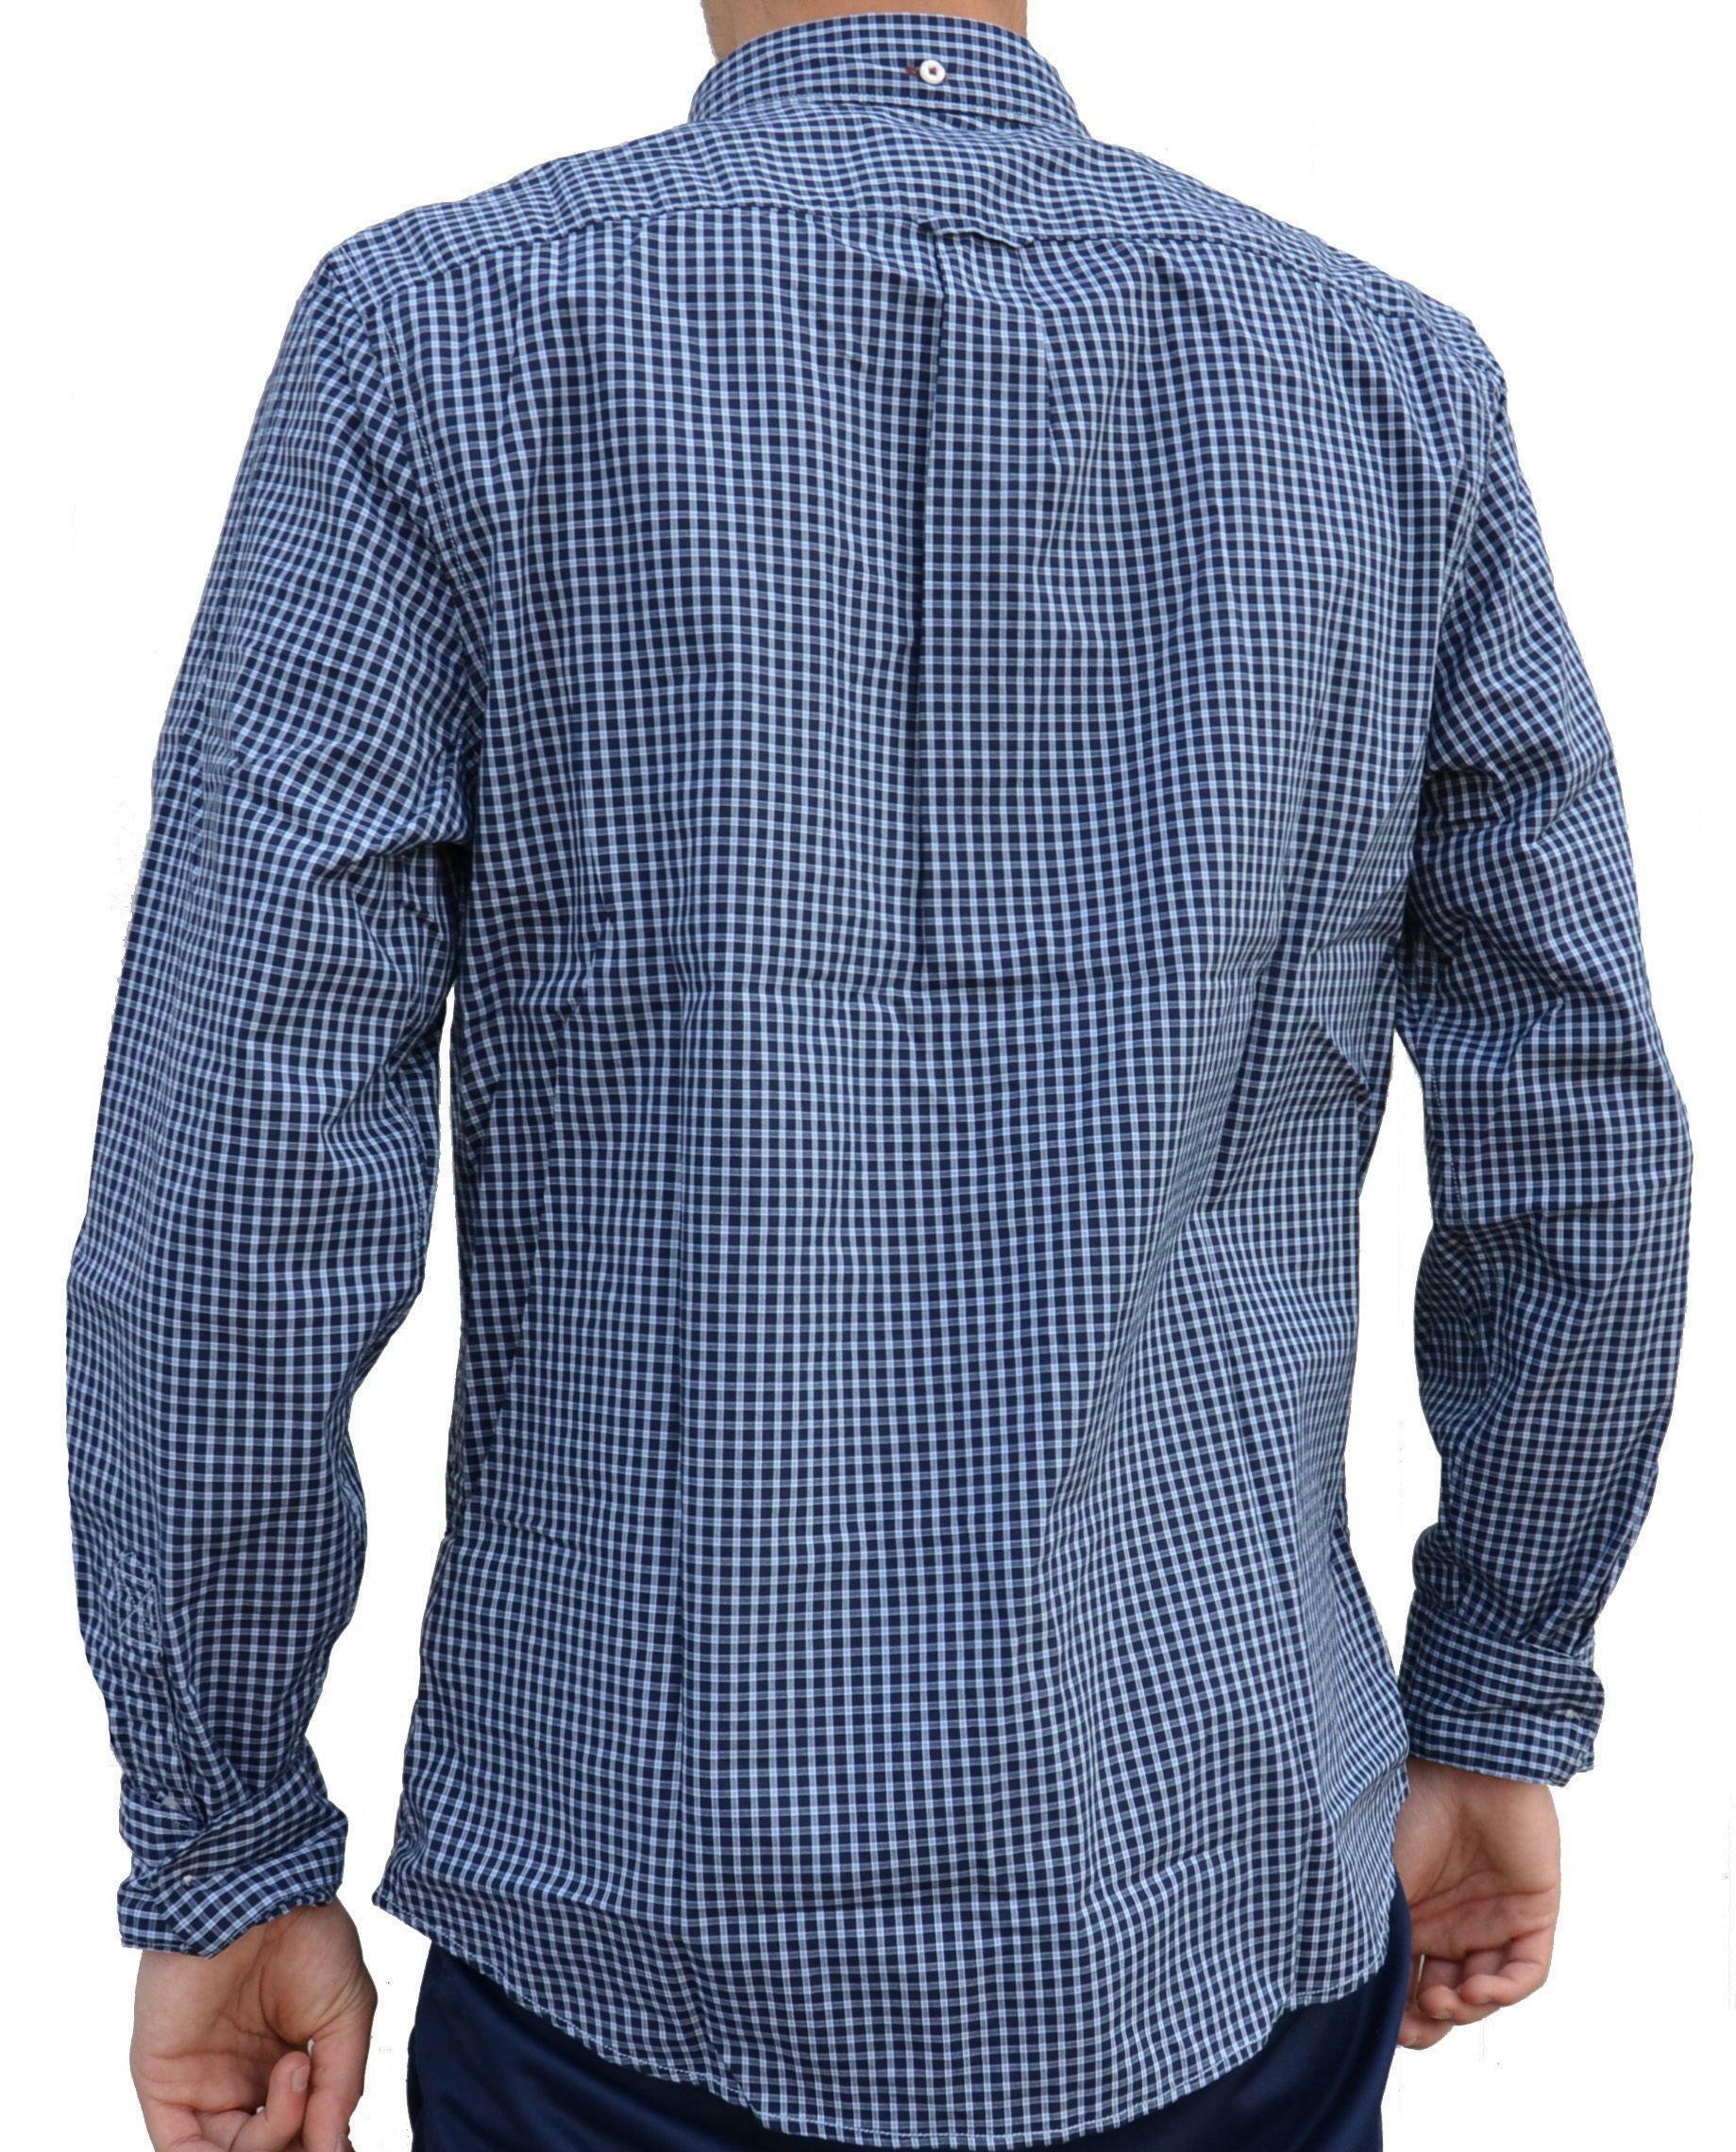 timberland timberland ls snck rv strt camicia uomo a quadri blu